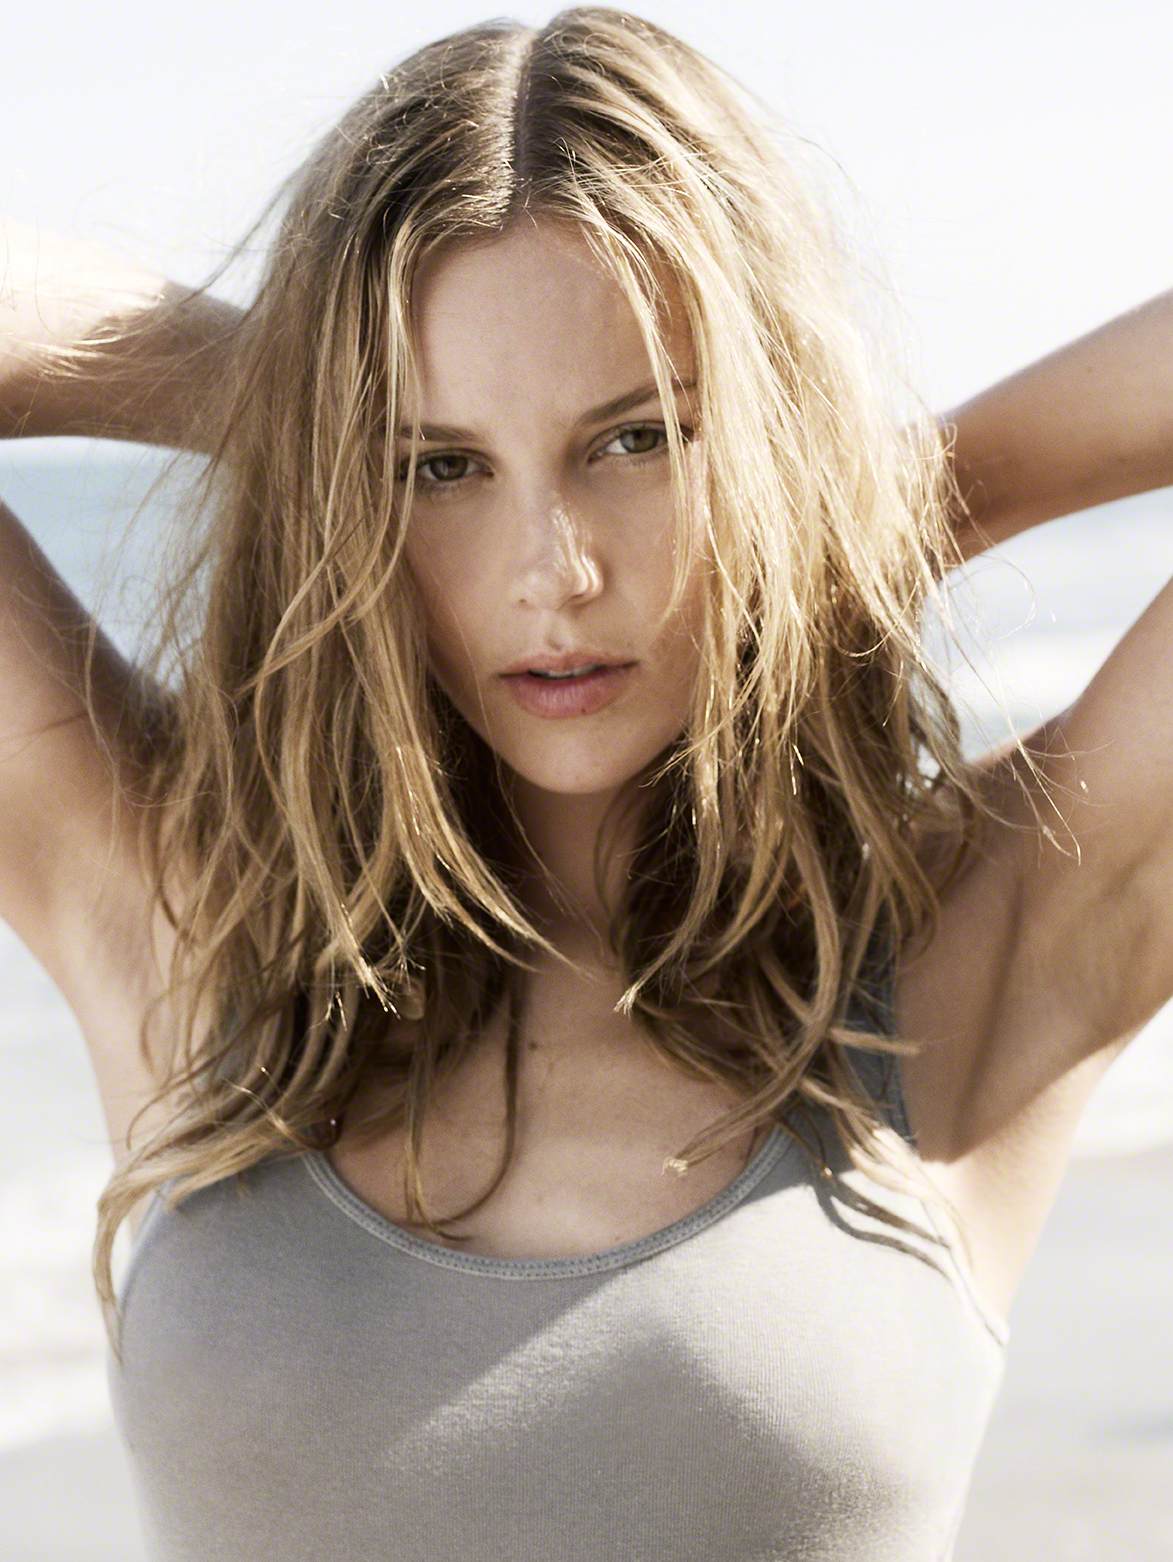 Selfie Isabelle Cornish nude (61 photo), Tits, Cleavage, Instagram, underwear 2006